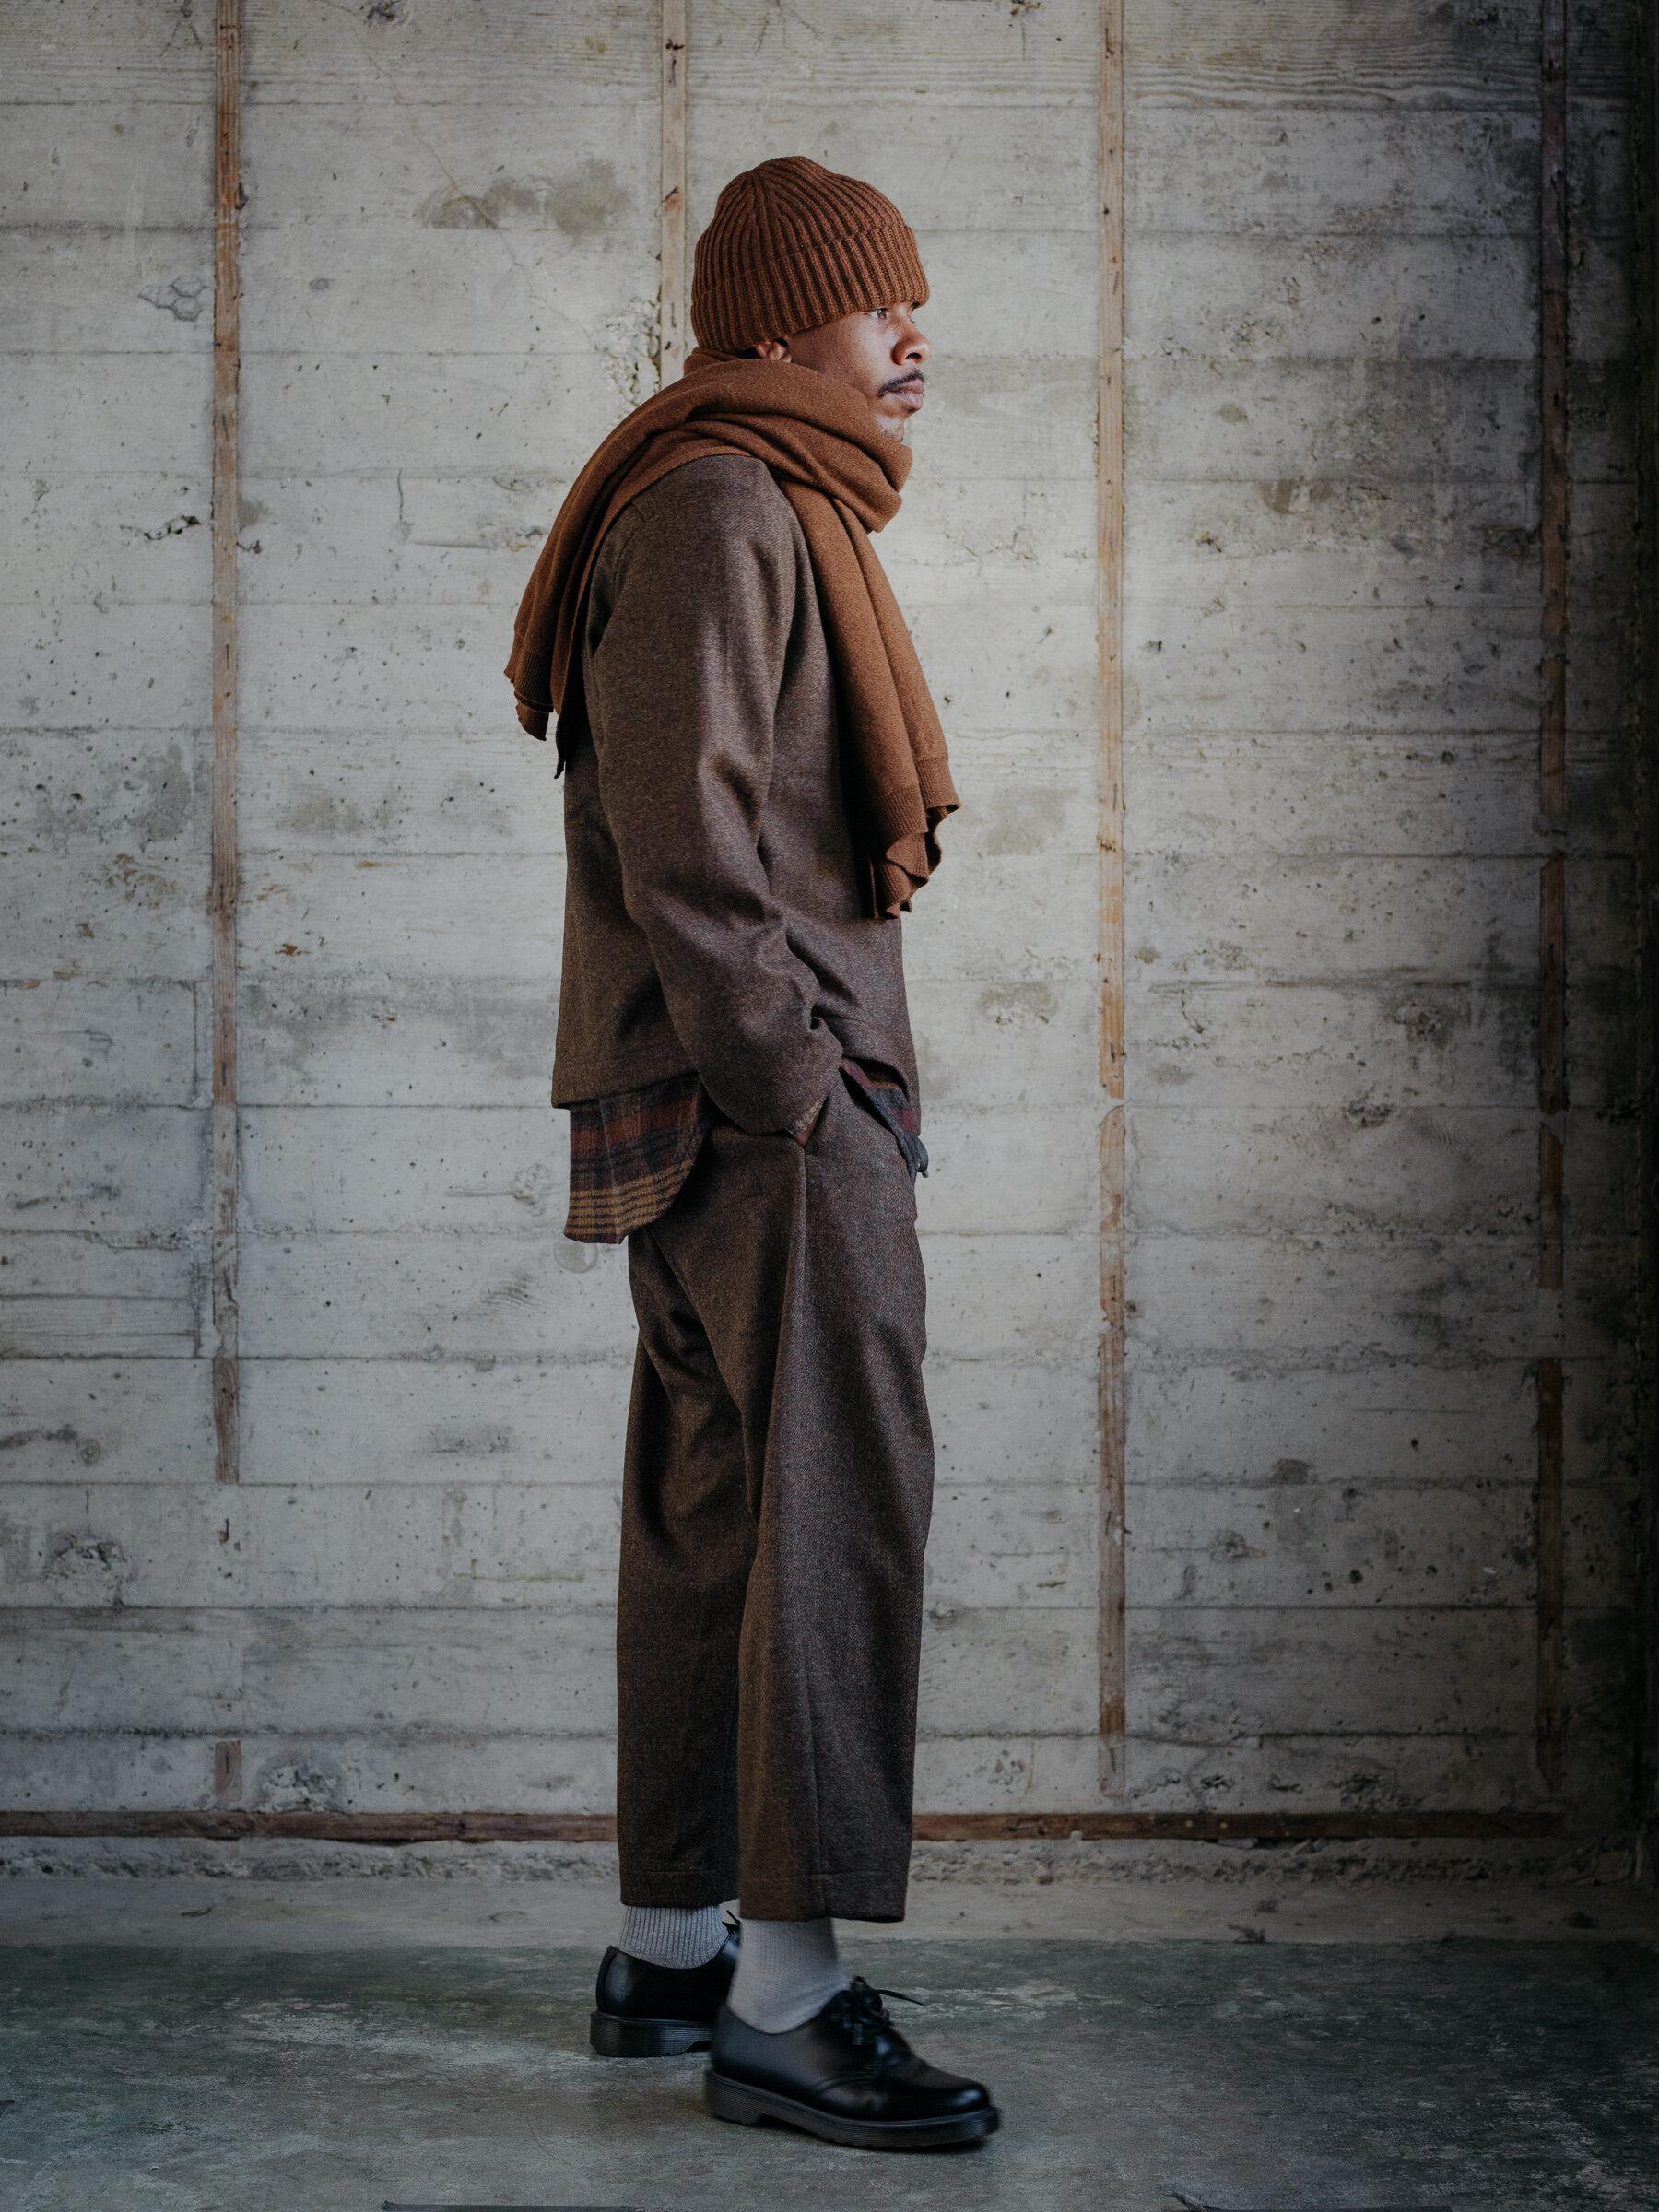 evan-kinori-knit-shawl-cashmere-lambswool-made-in-italy-3